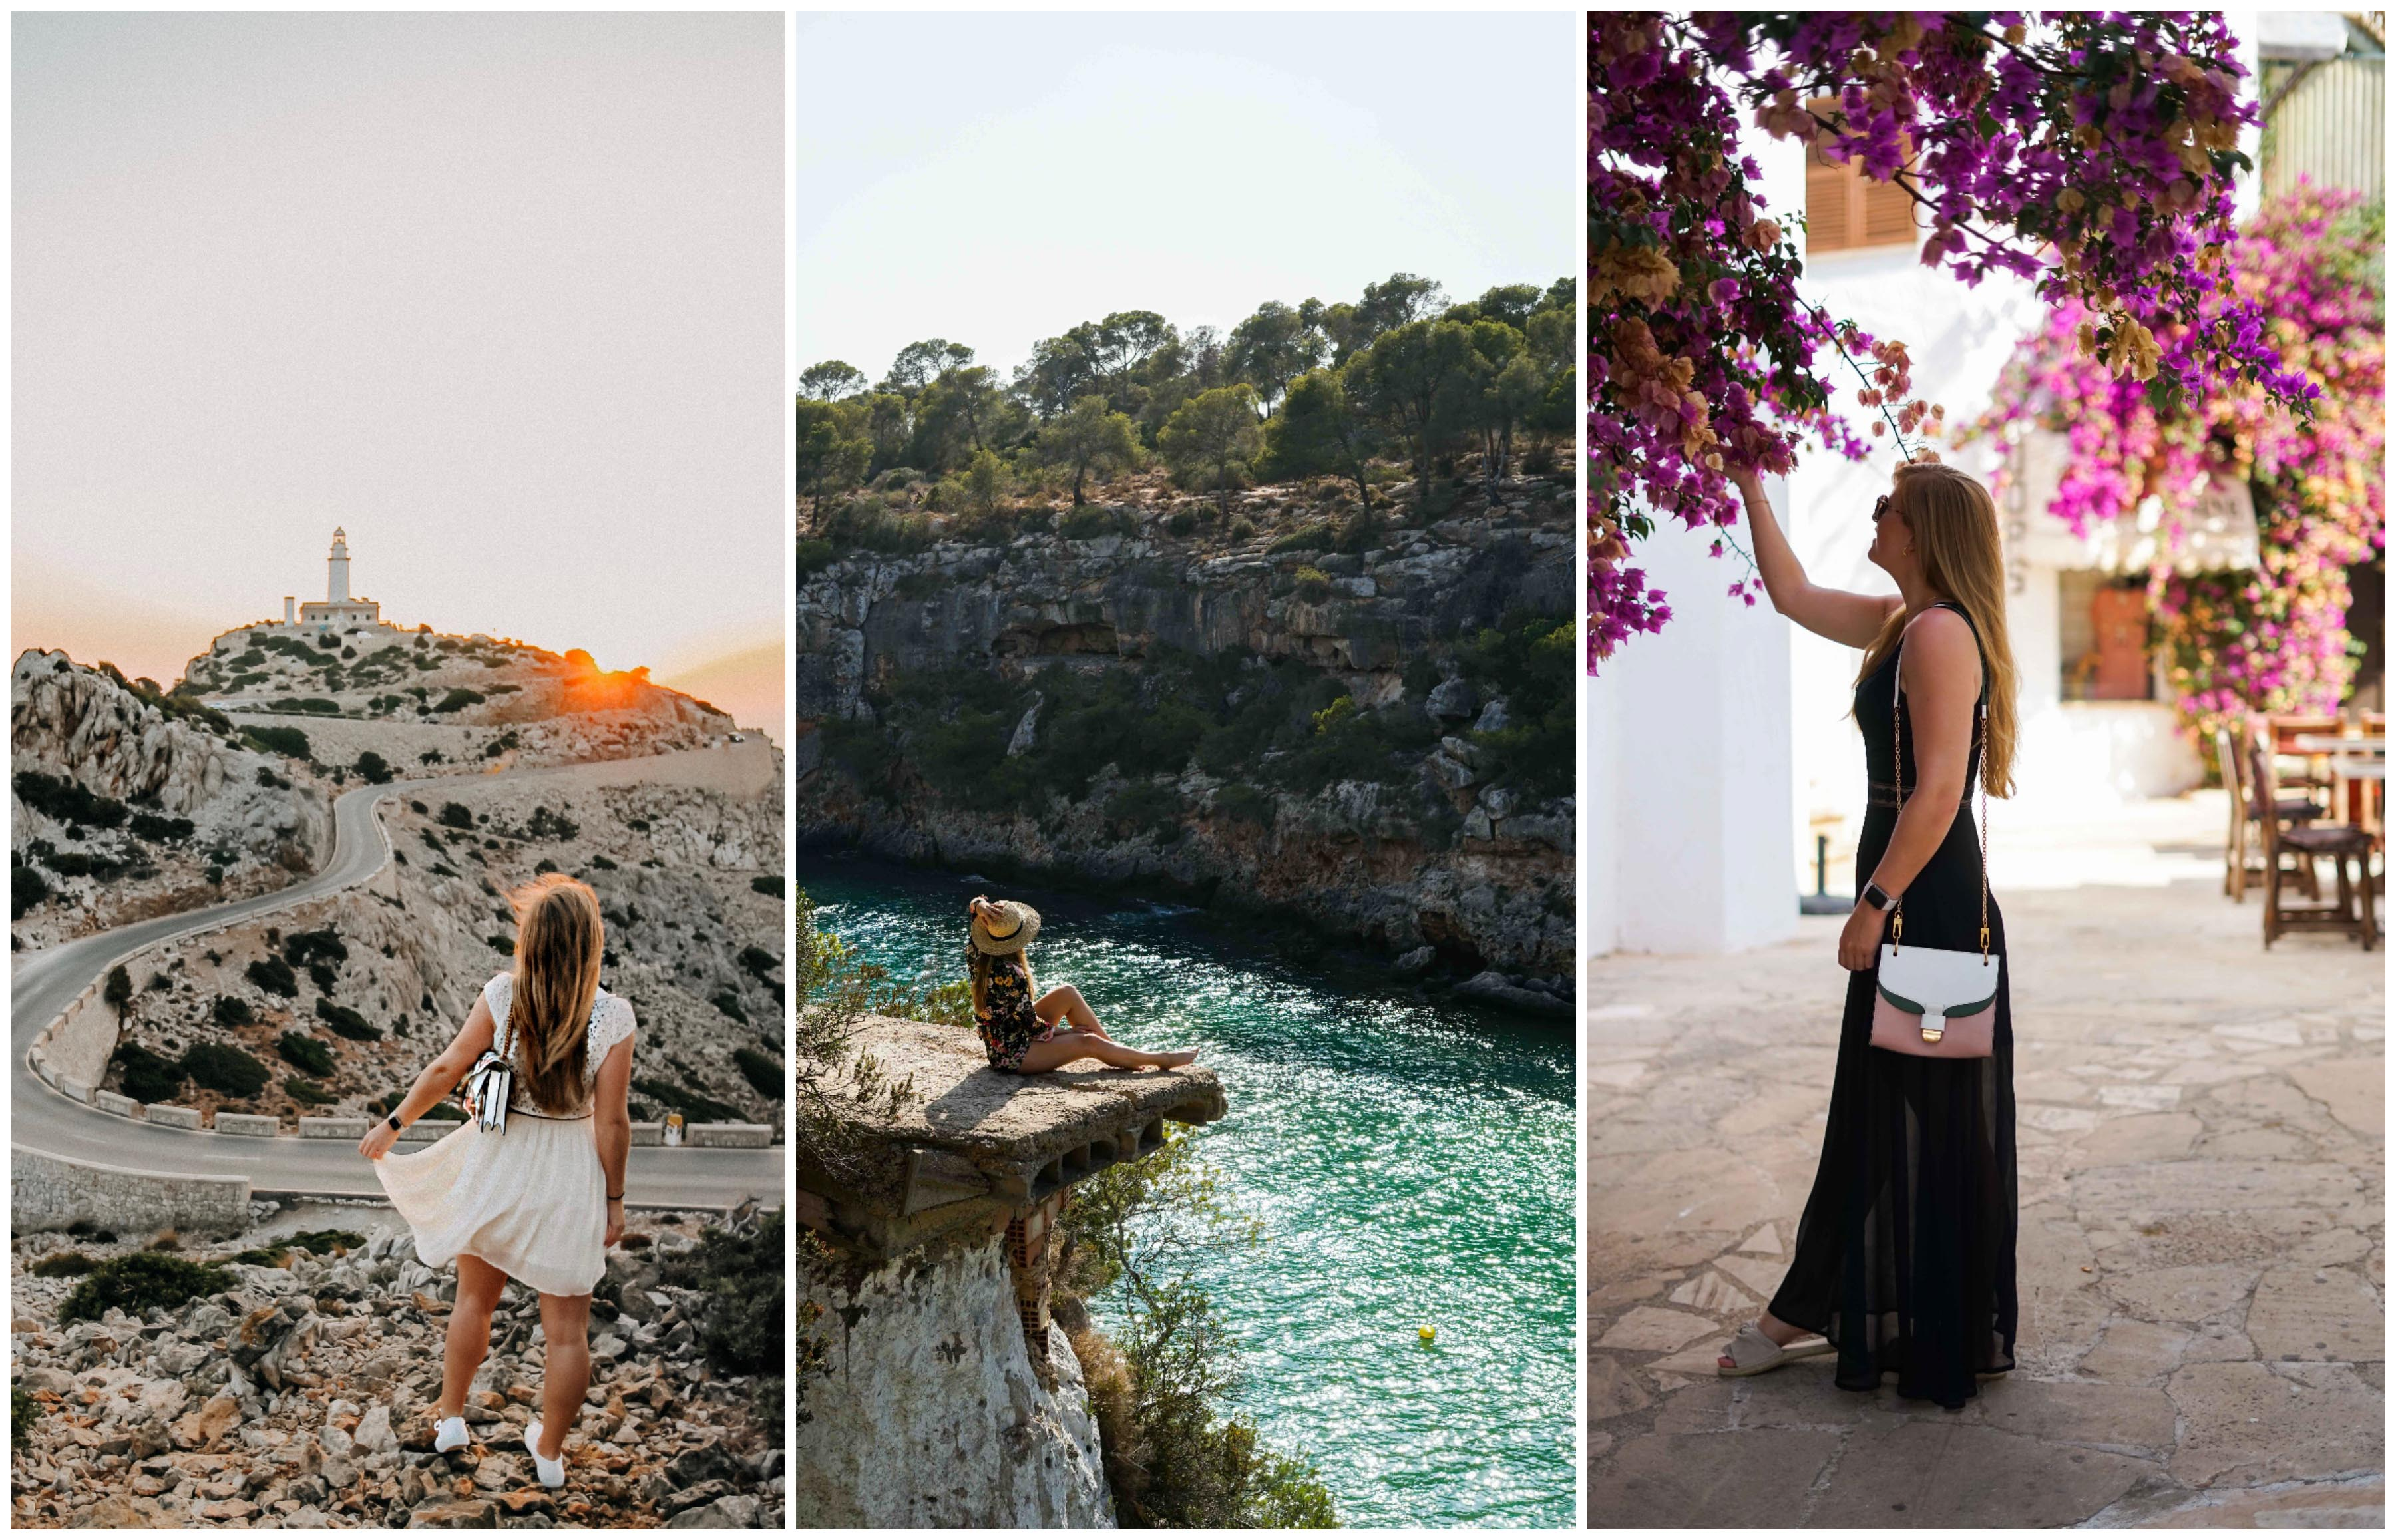 Top 20 Mallorca Instagram Spots   Schönsten Fotospots ...